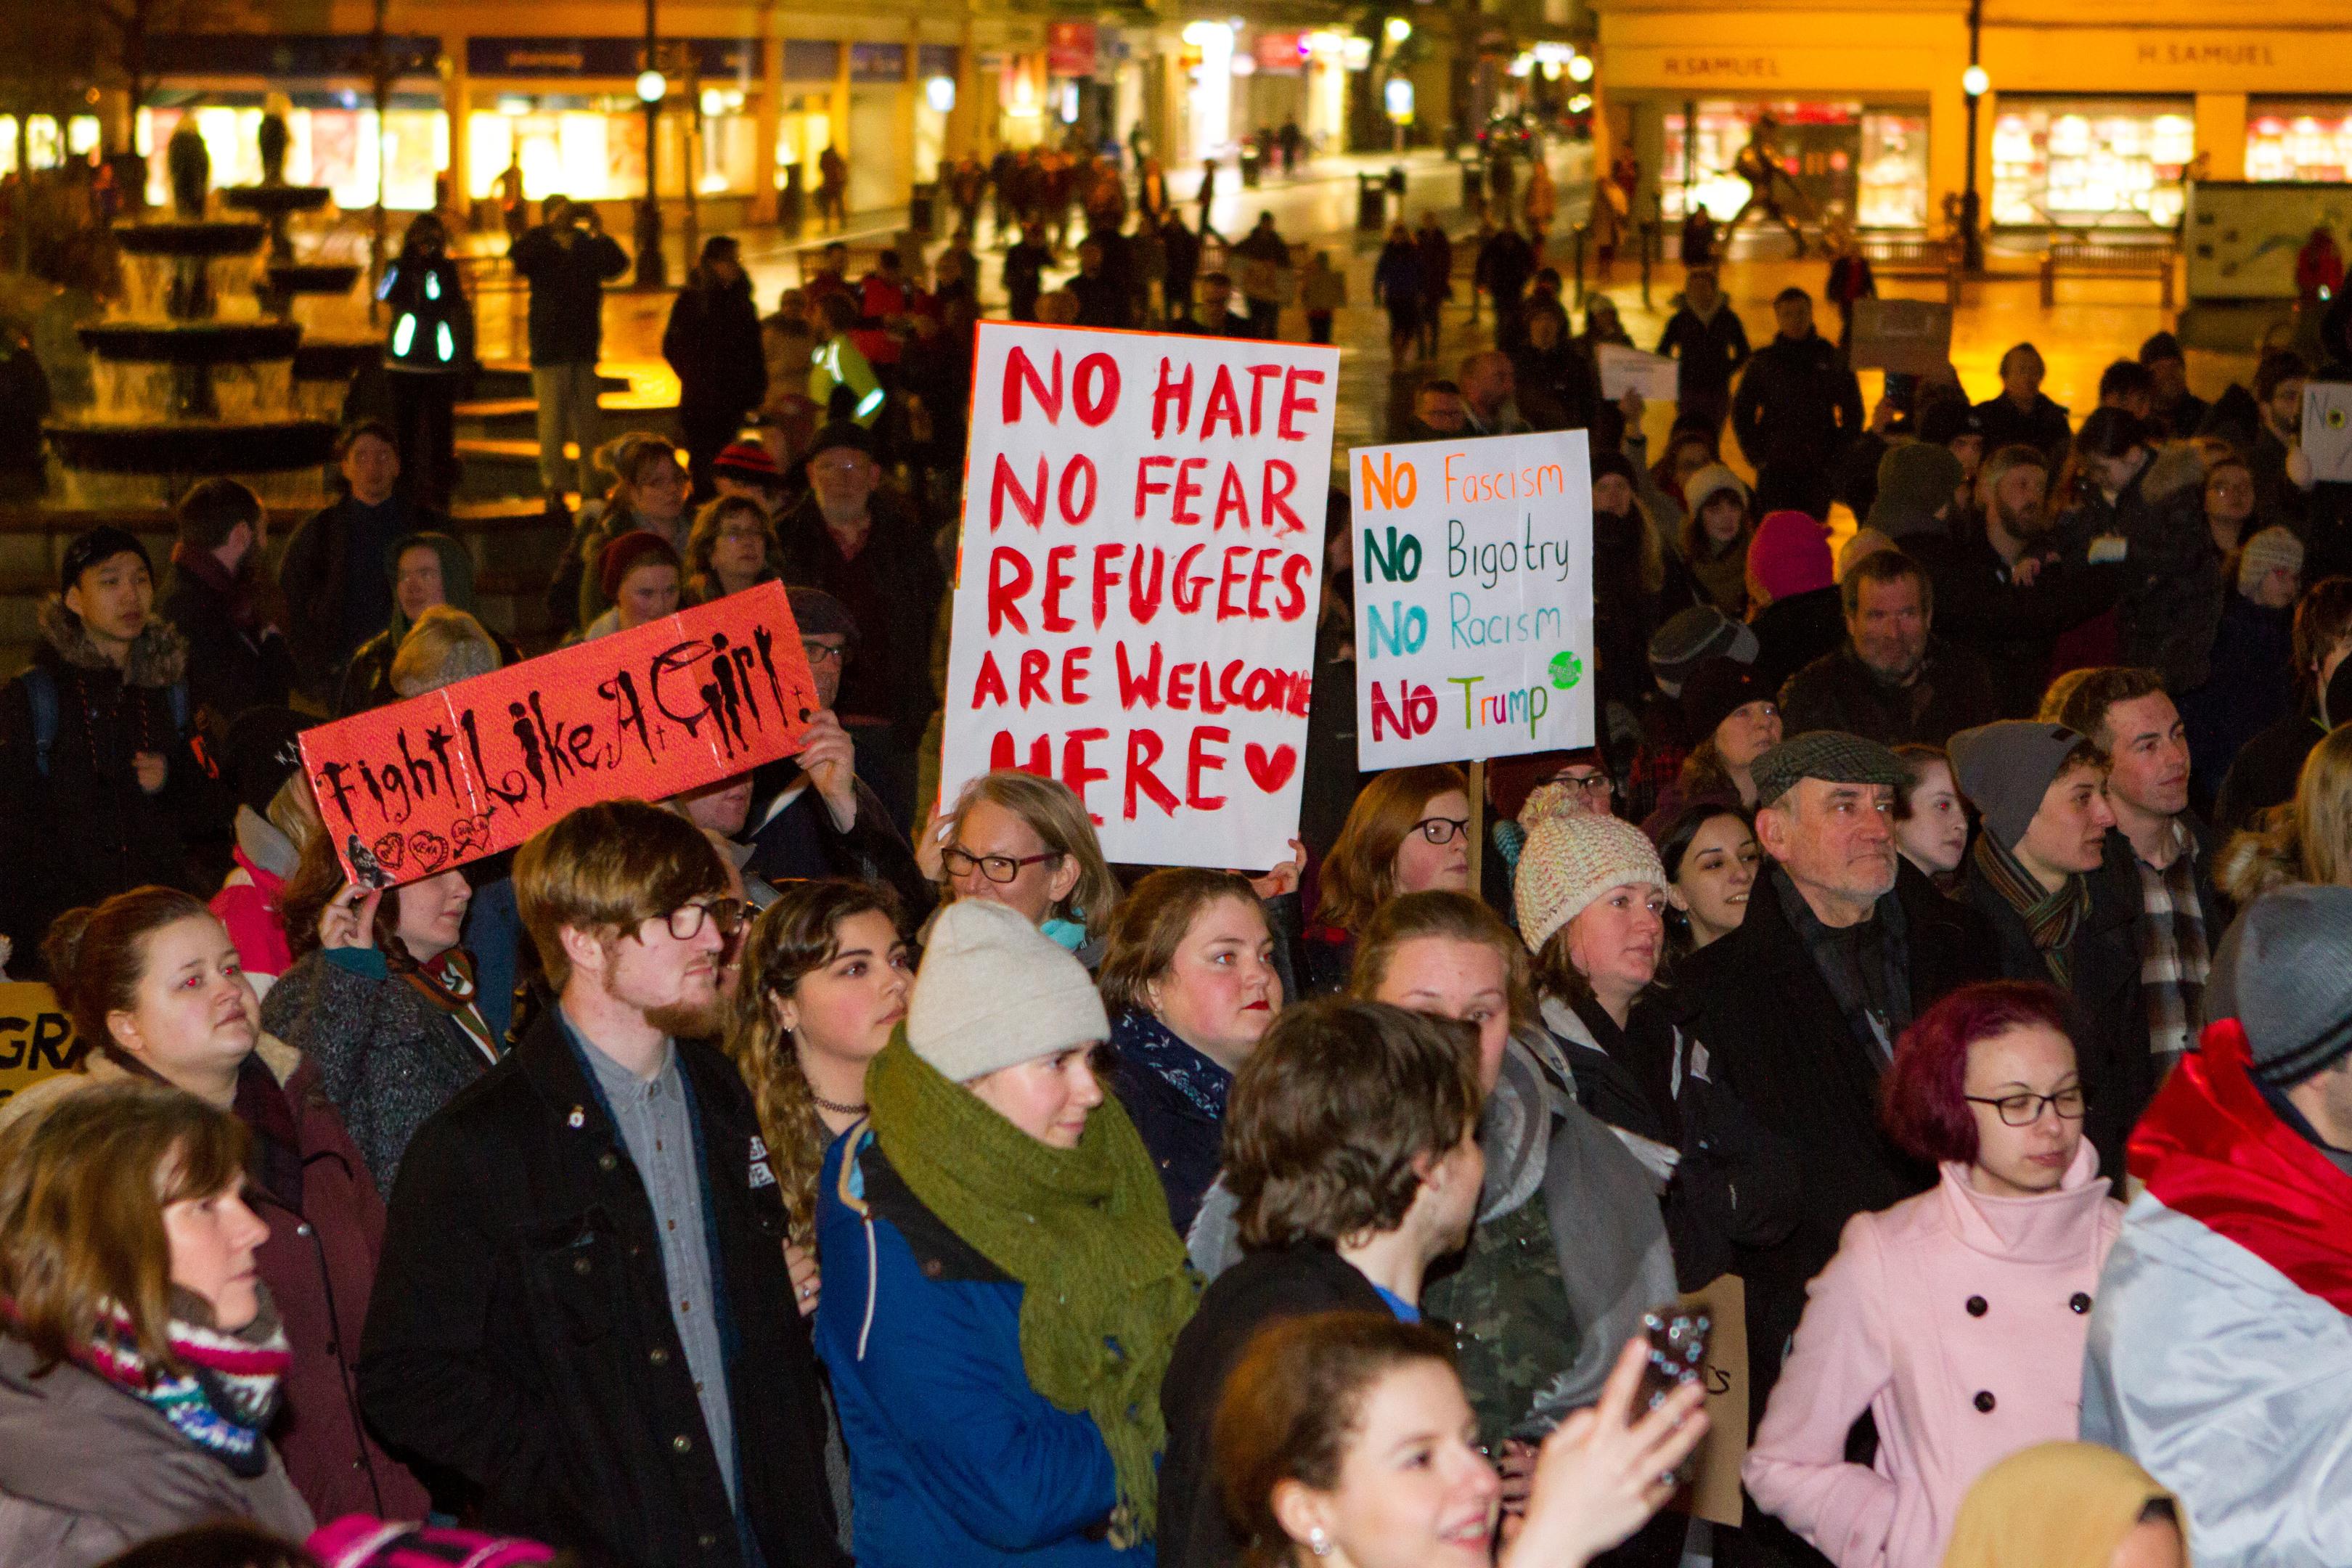 Protesters in City Square.